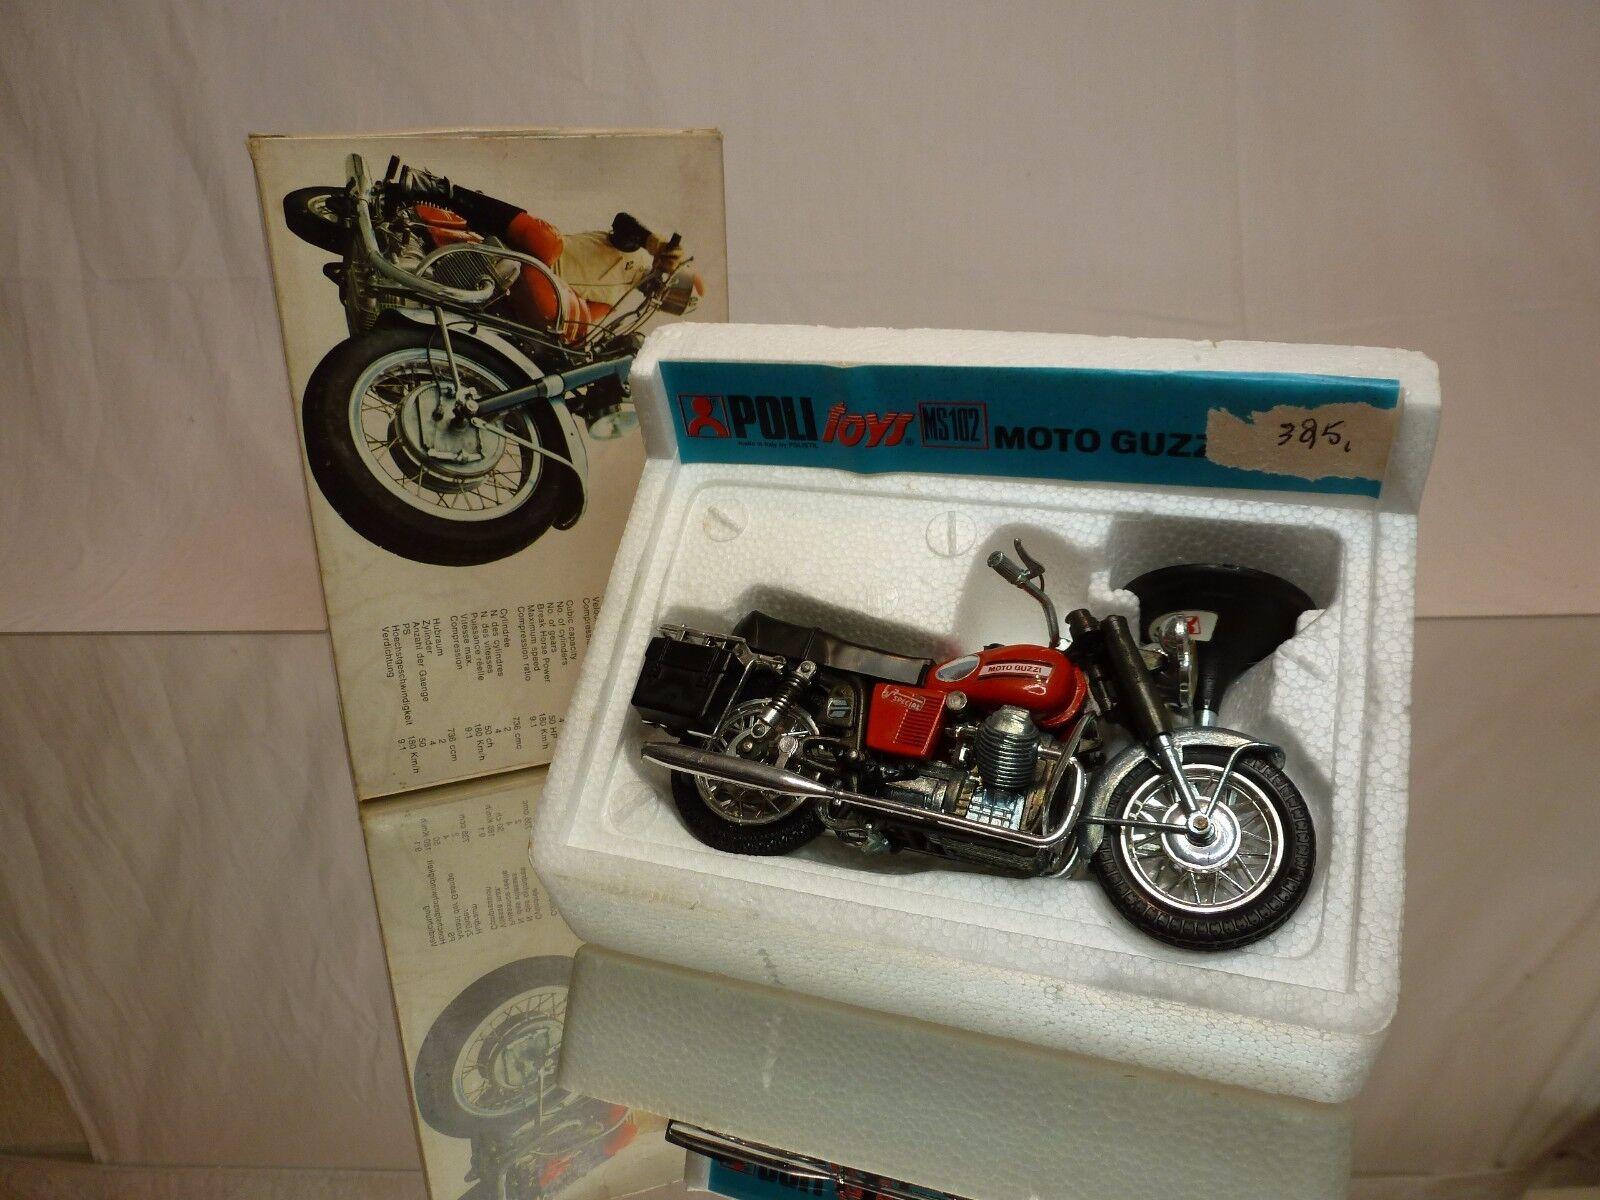 POLISTIL POLITOYS MS102 MOTO GUZZI V7 SPECIAL - rosso 1 15 - GOOD CONDITION IN BOX